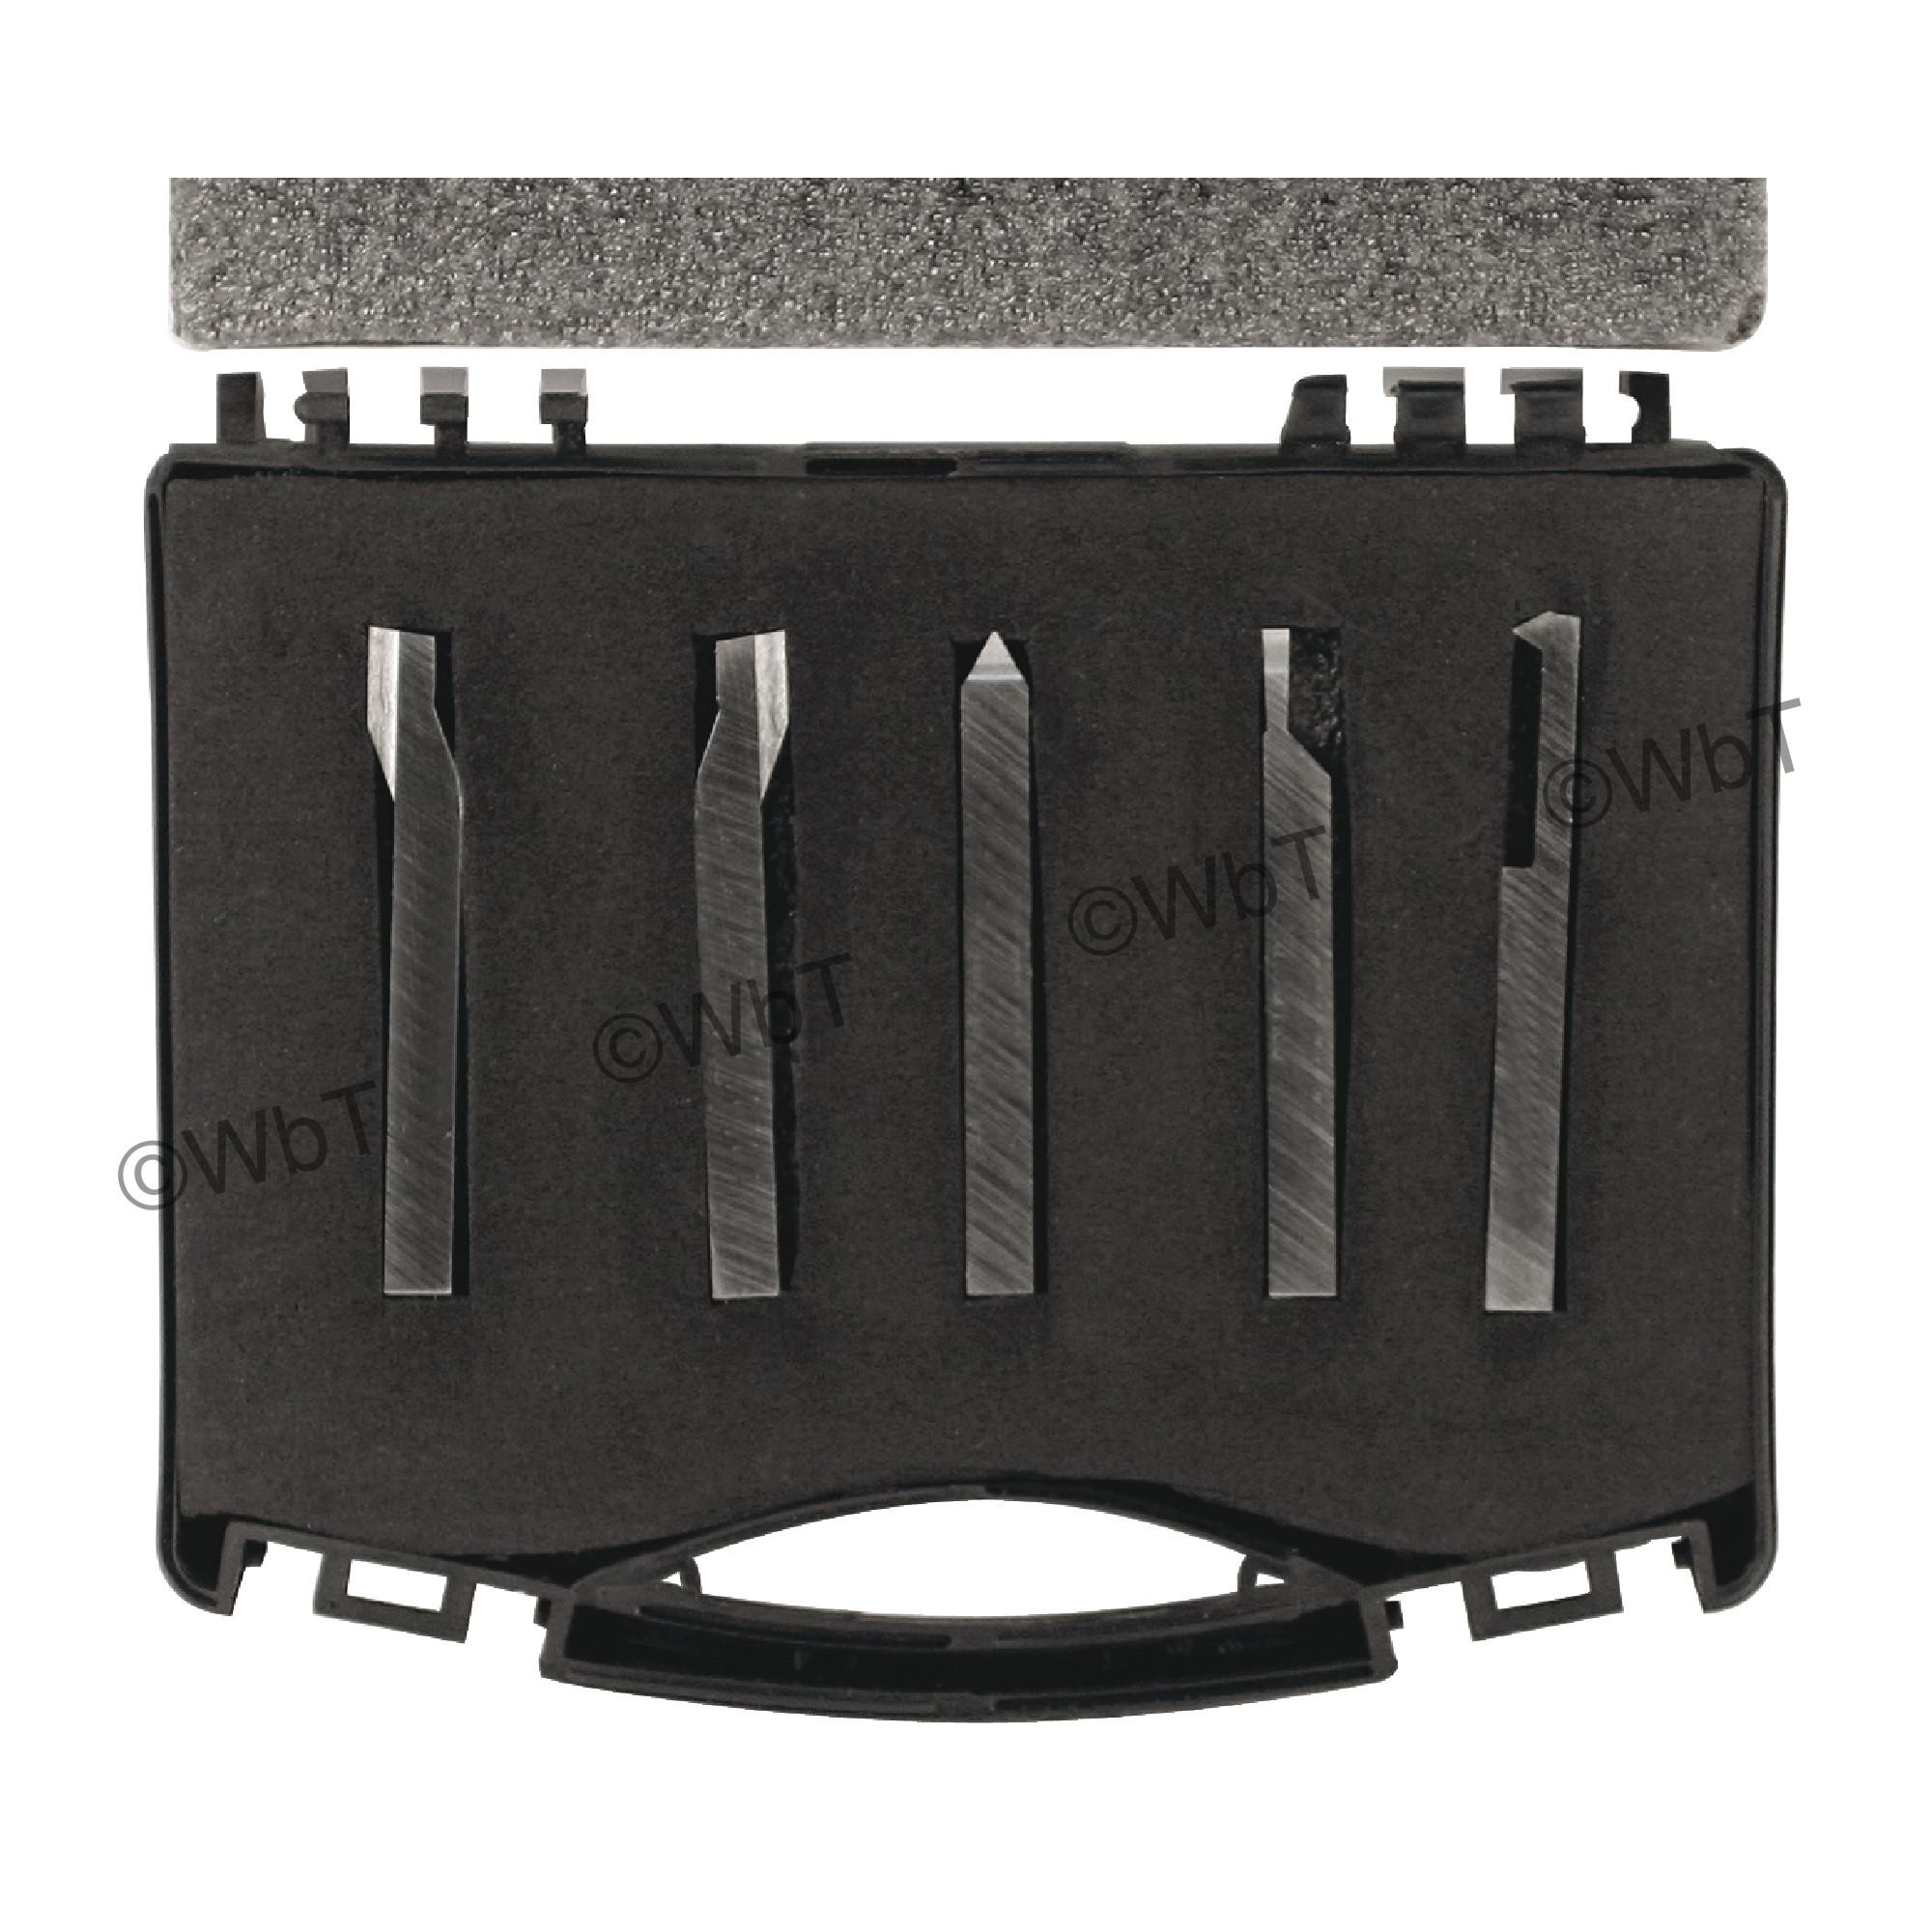 5 PC 1/2 Shank High Speed Steel Lathe Tool Set